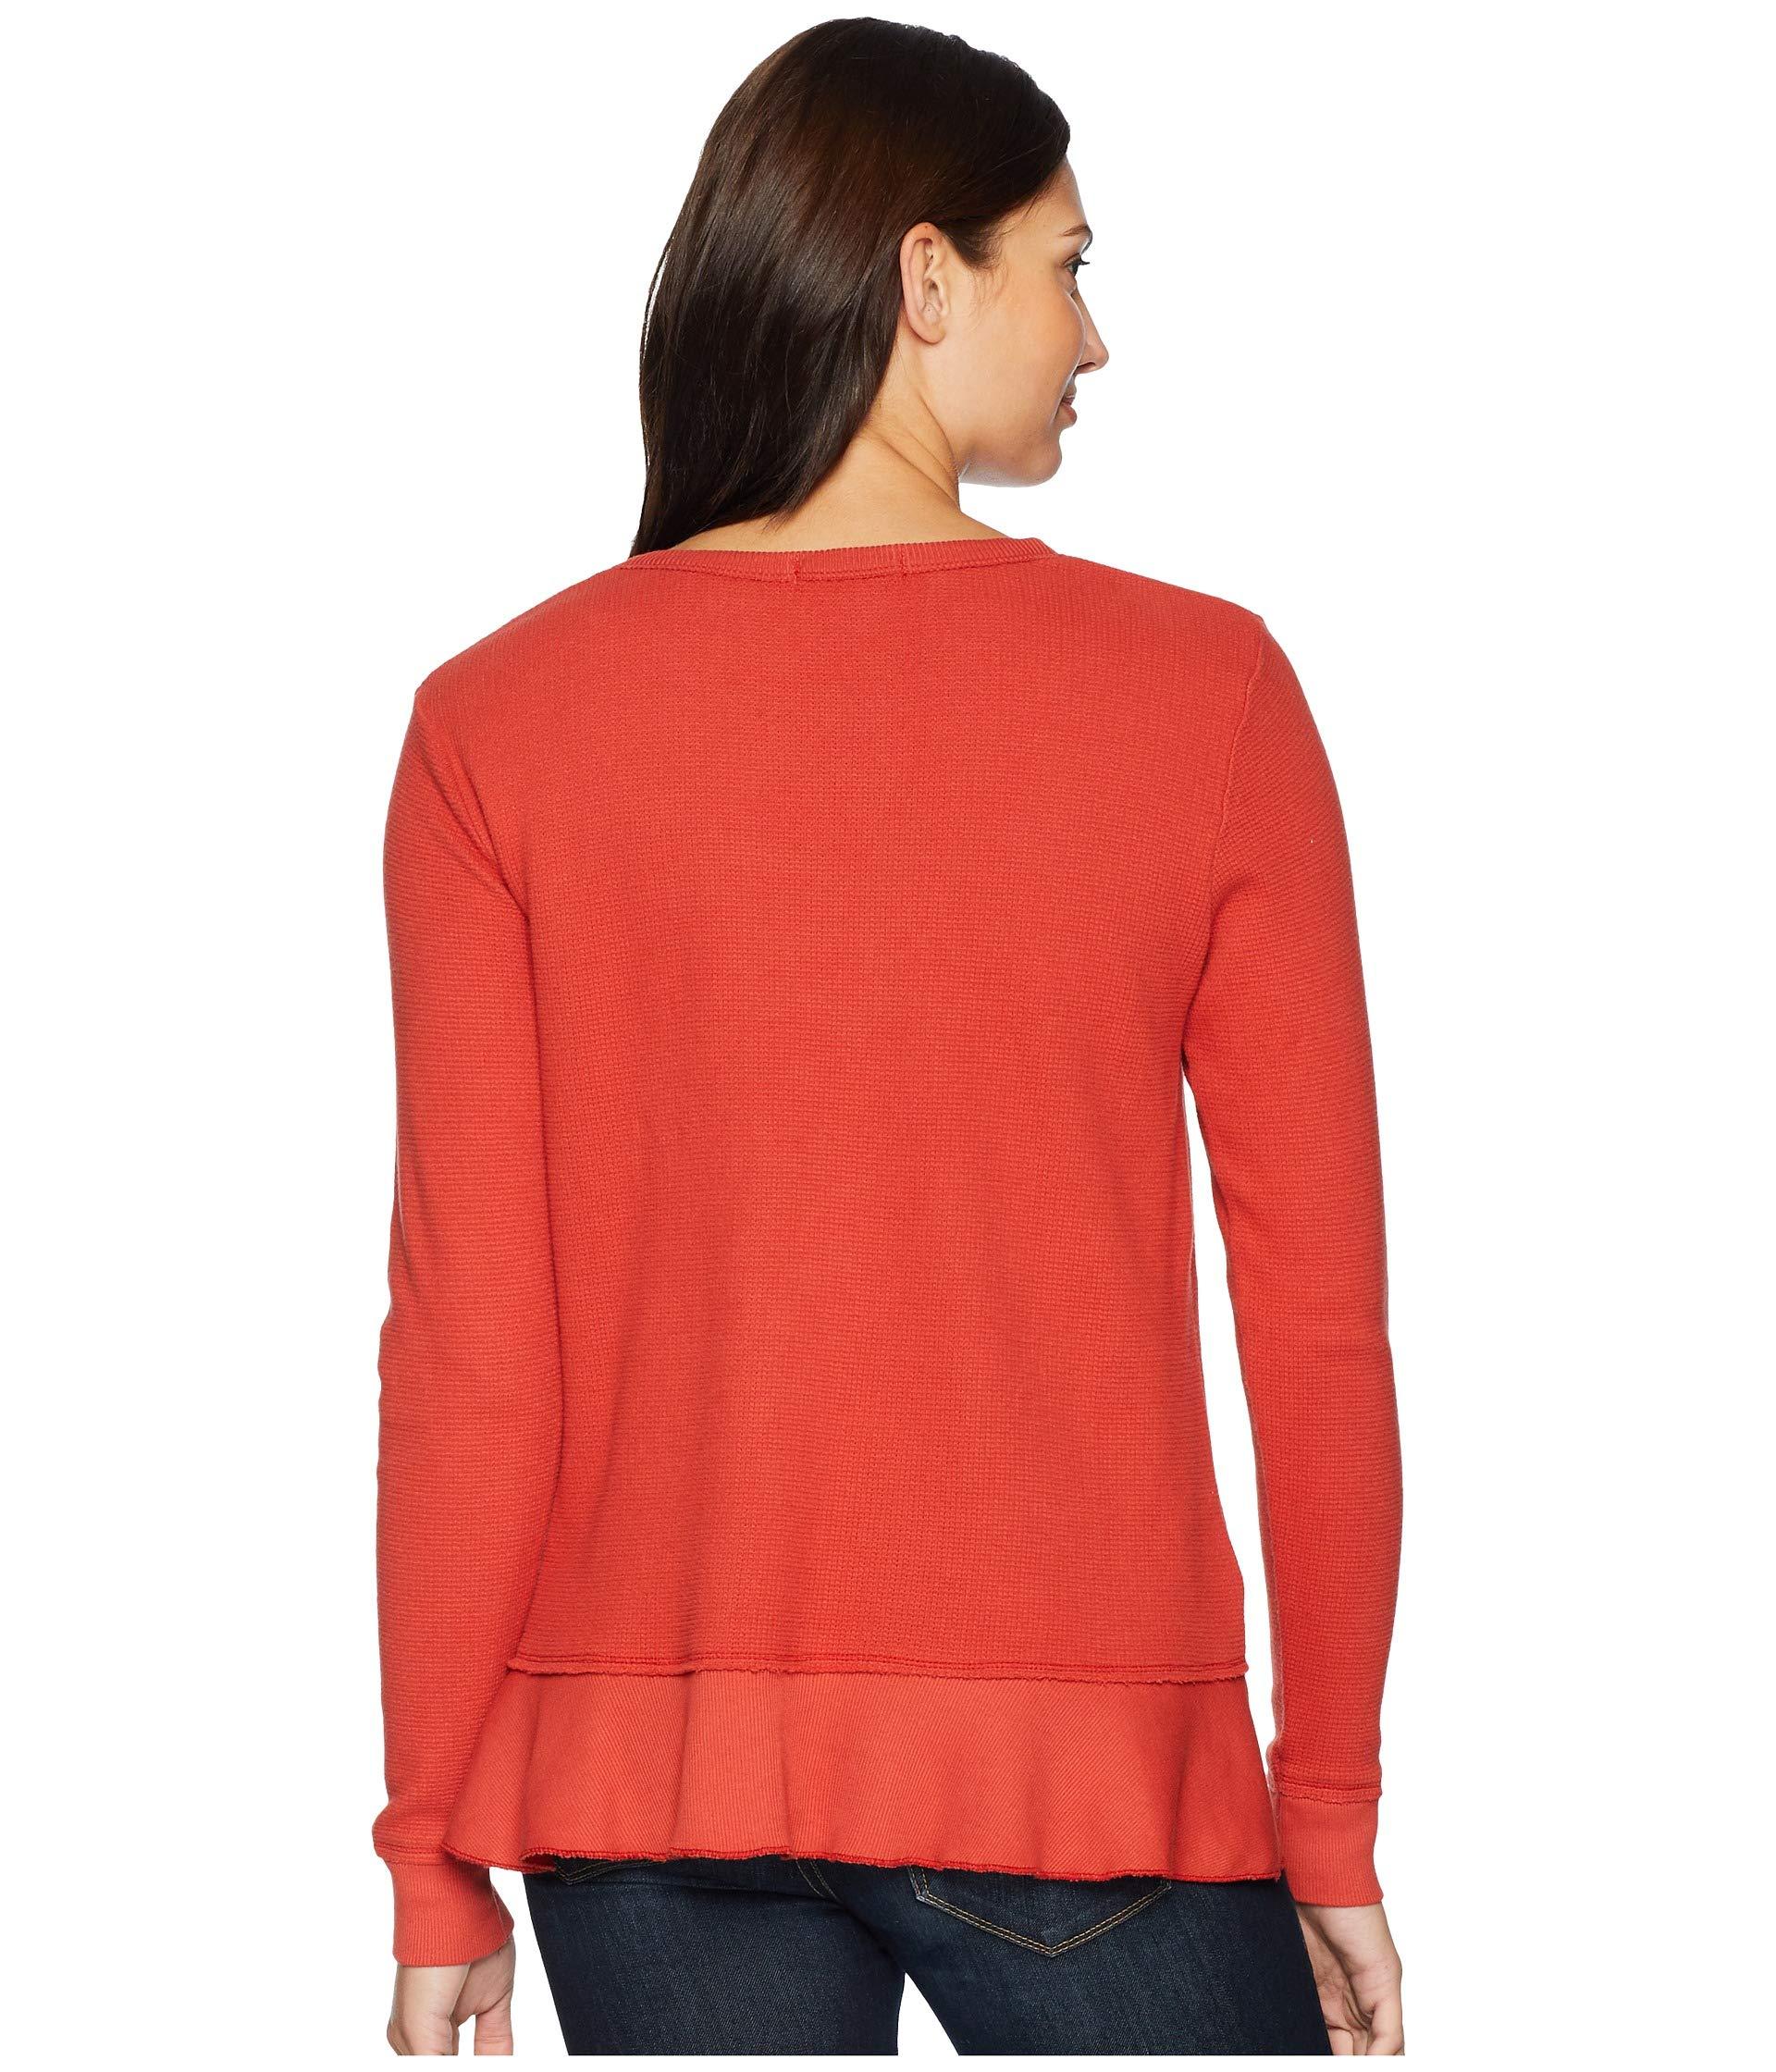 Hem Sleeve o Bonfire Mod Sweatshirt Long With Thermal Flatback Flounce Tee doc vfvXAwO